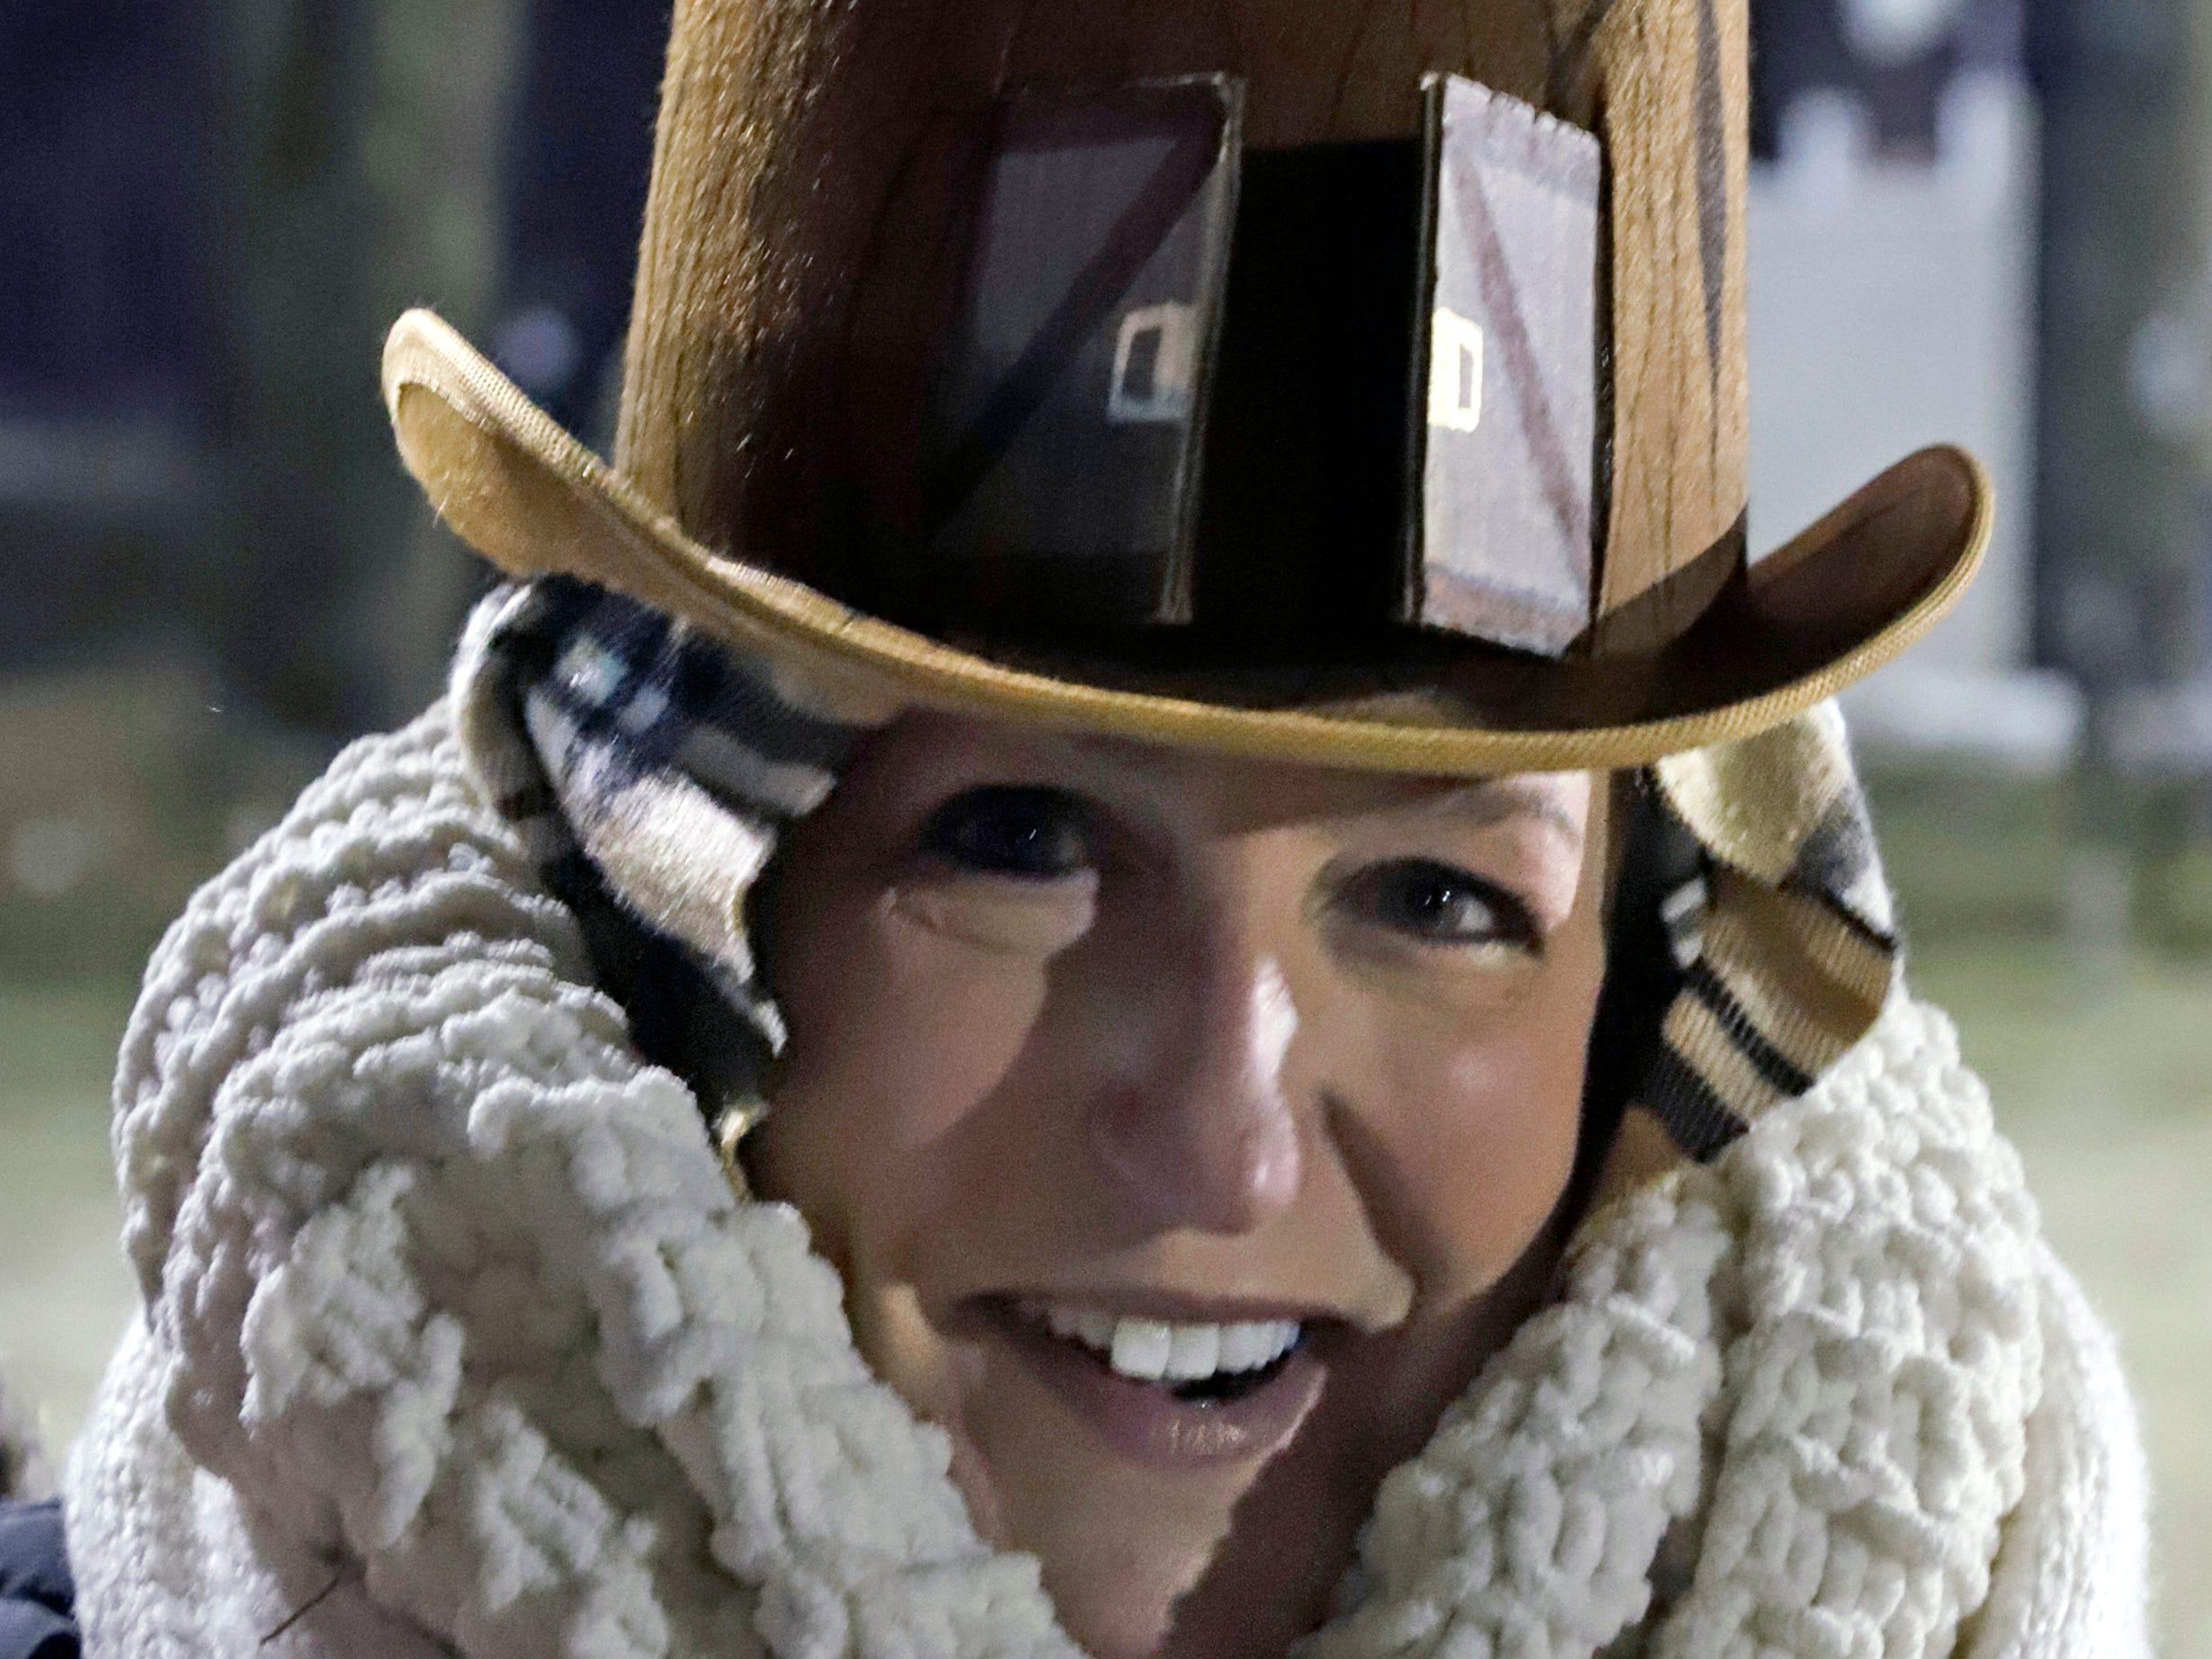 Lisa Gibson of Pittsburgh arrives bundled up to begin celebrating the 133rd Groundhog Day on Gobbler's Knob in Punxsutawney, Pa. Saturday, Feb. 2, 2019. (AP Photo/Gene J. Puskar)